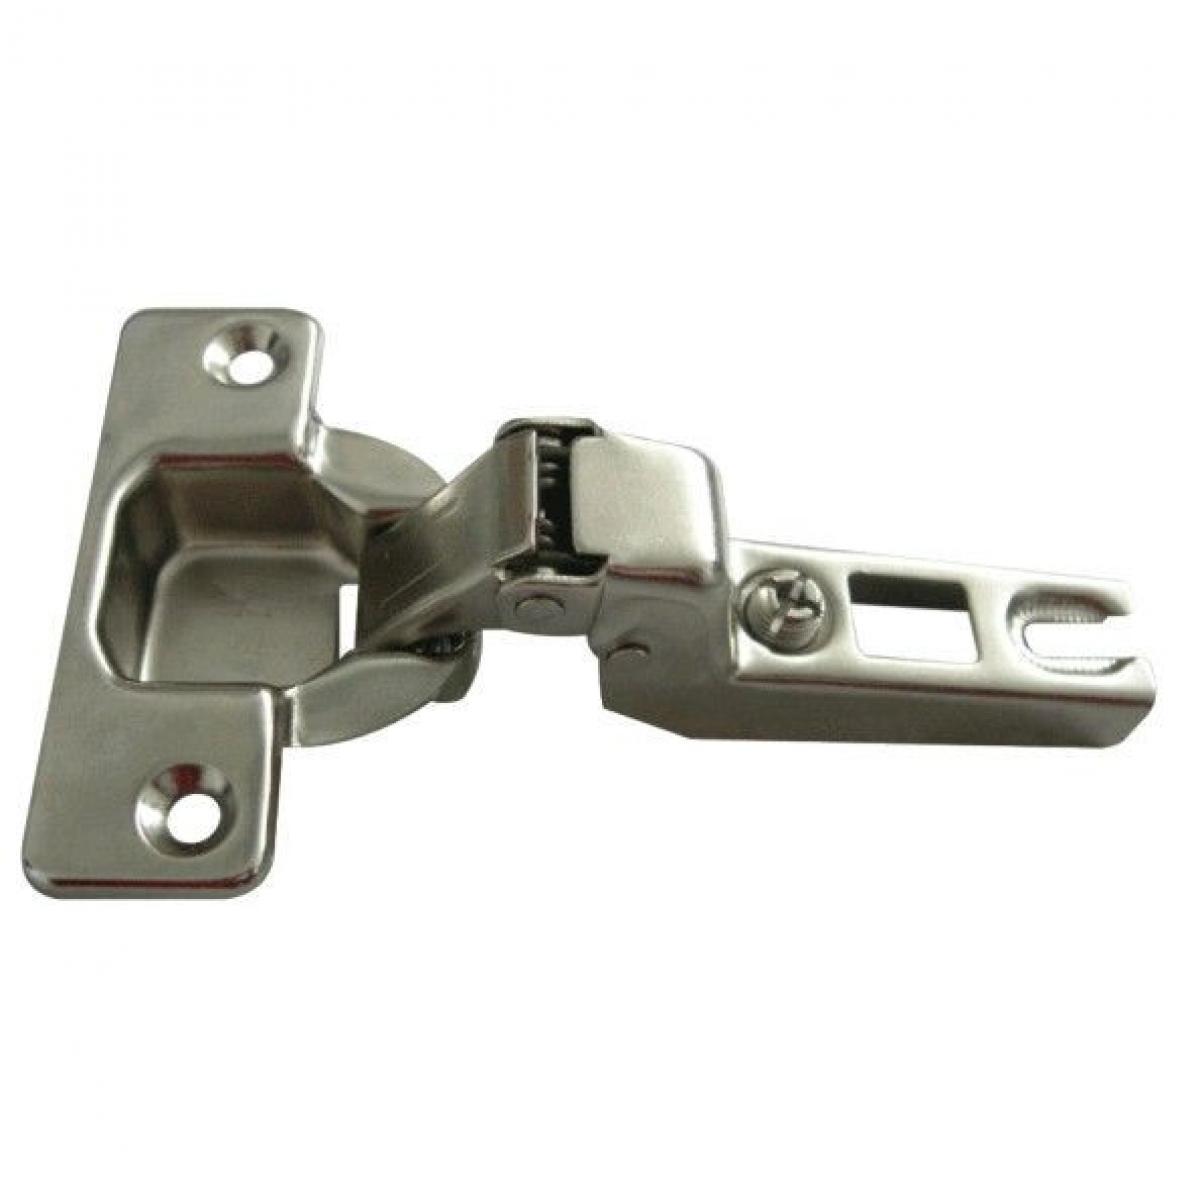 Петля 303 Slide-On D35мм для вкладных дверей